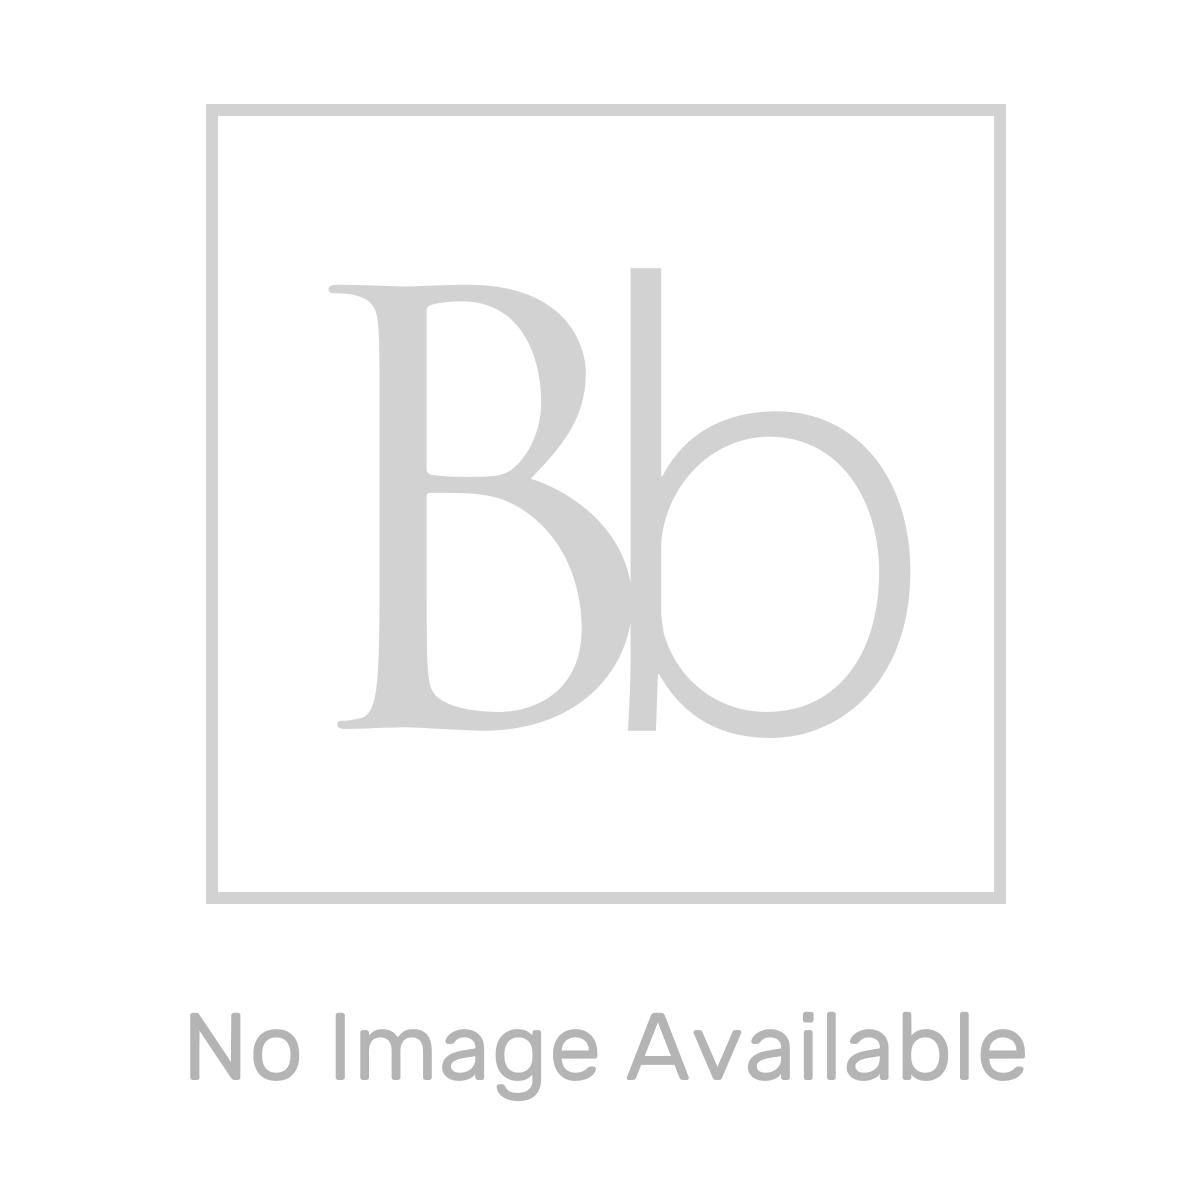 RAK Surface Light Sand Rustic Tile 600 x 600mm